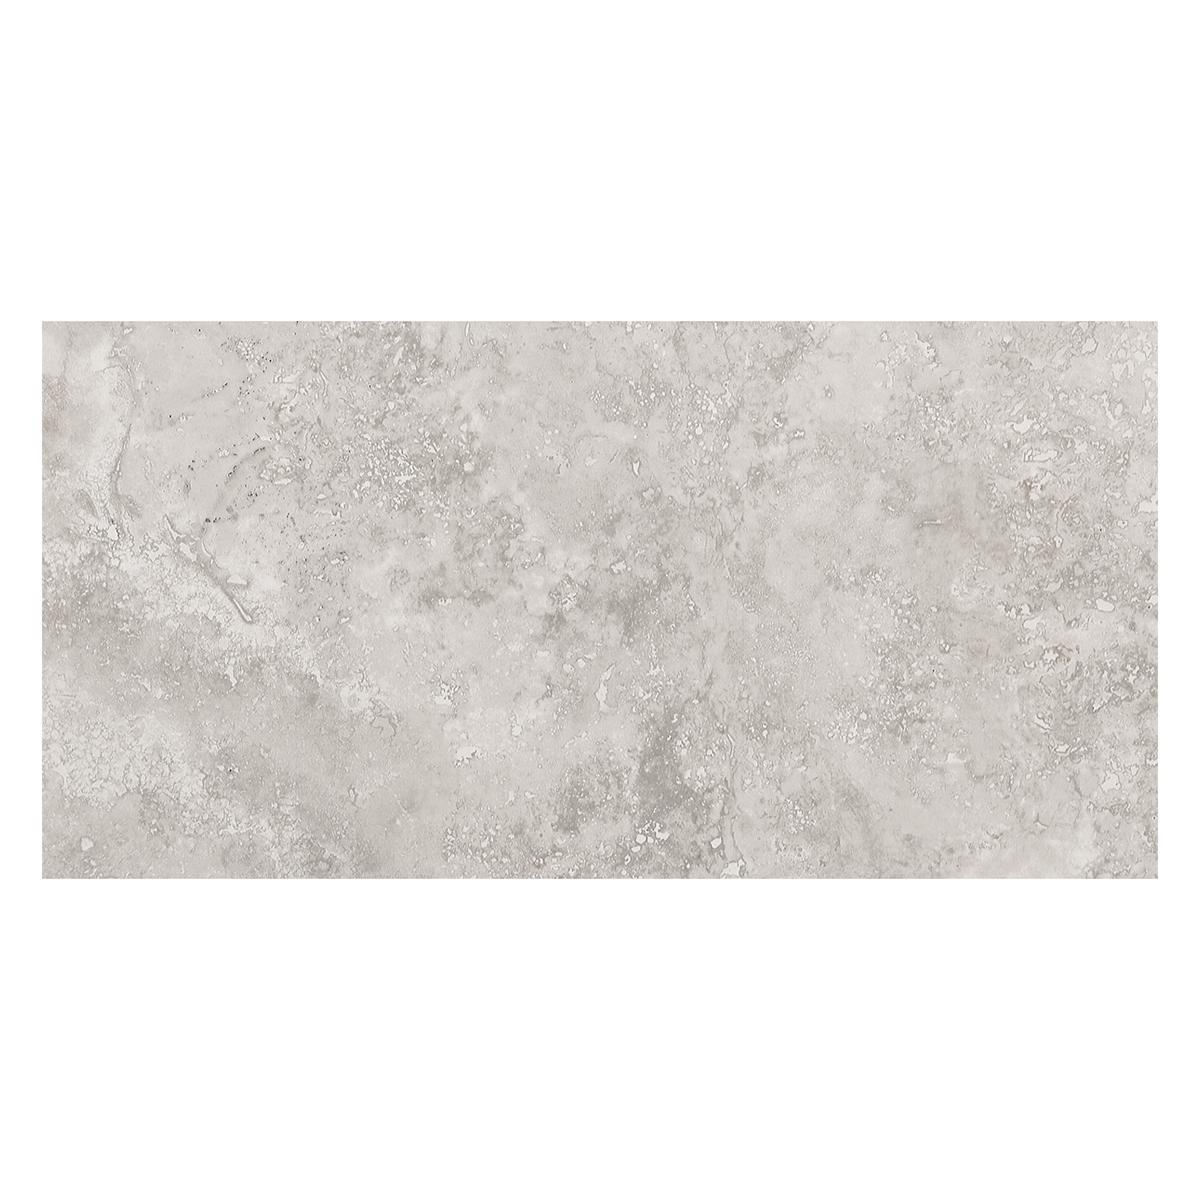 Gres Porcelánico Mineral Stone Gris Mate - 30X61 cm - 1.67 m2